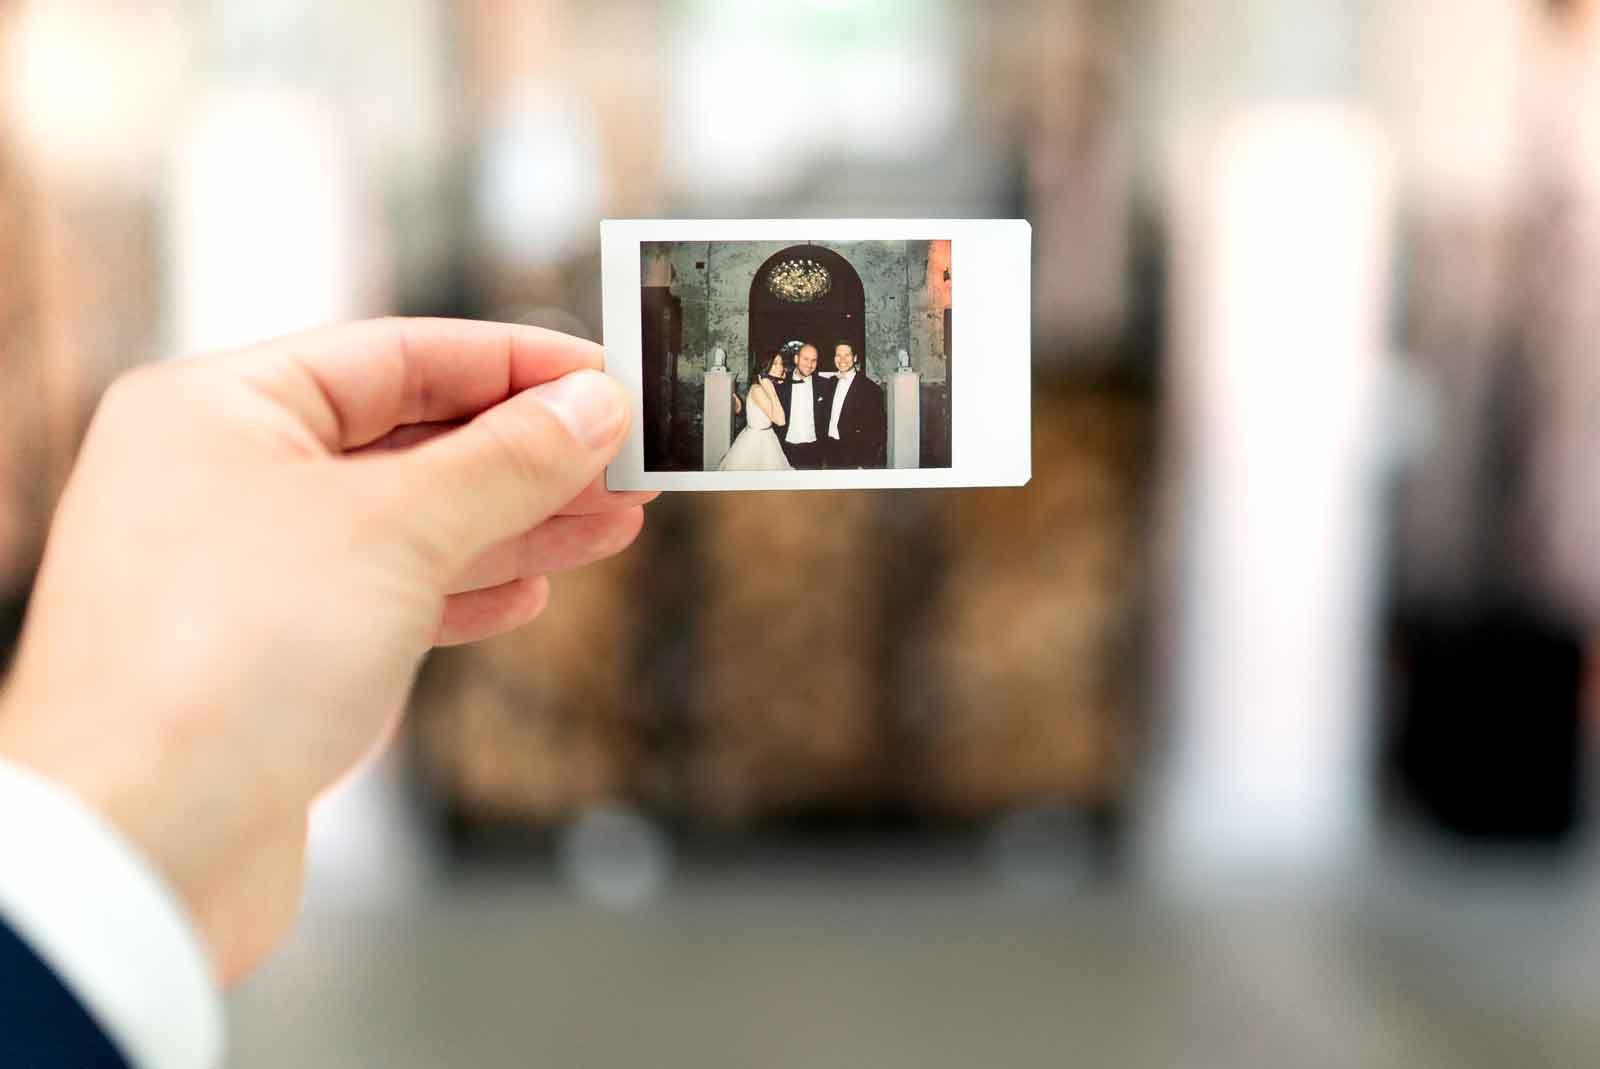 hochzeit-dj-alex-awesome-polaroid-memories.jpg